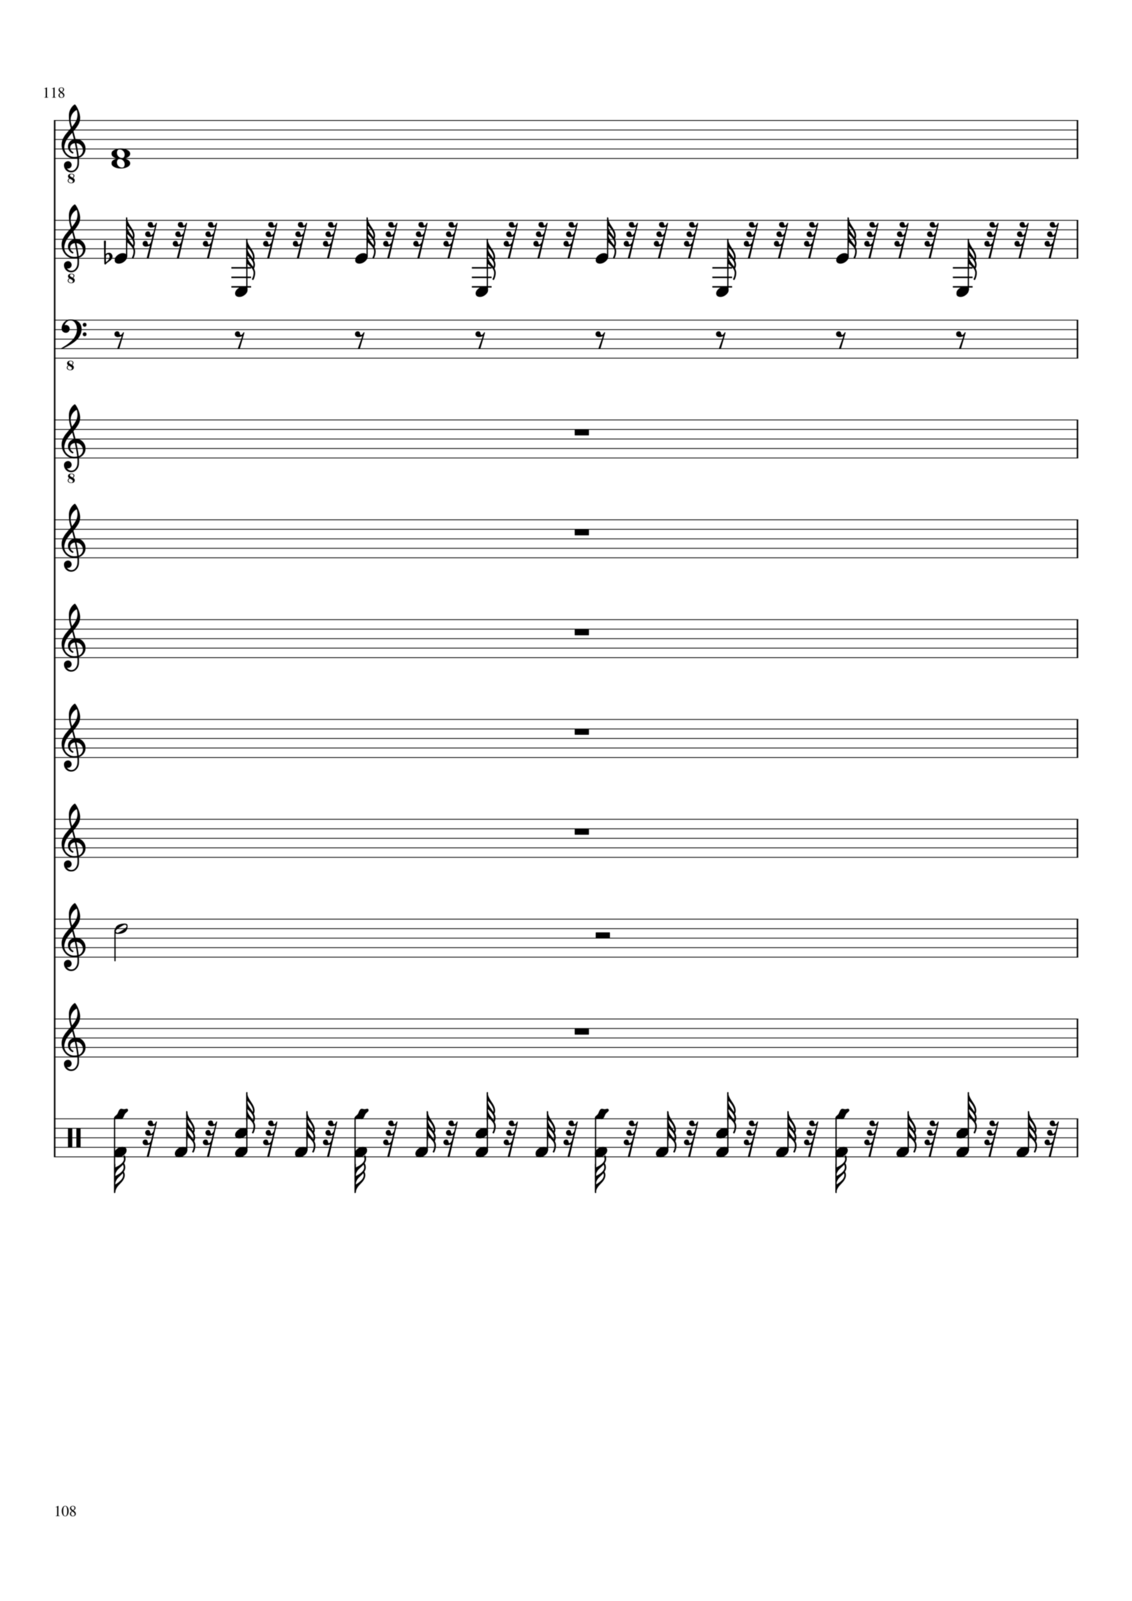 Belyiy sokol slide, Image 108